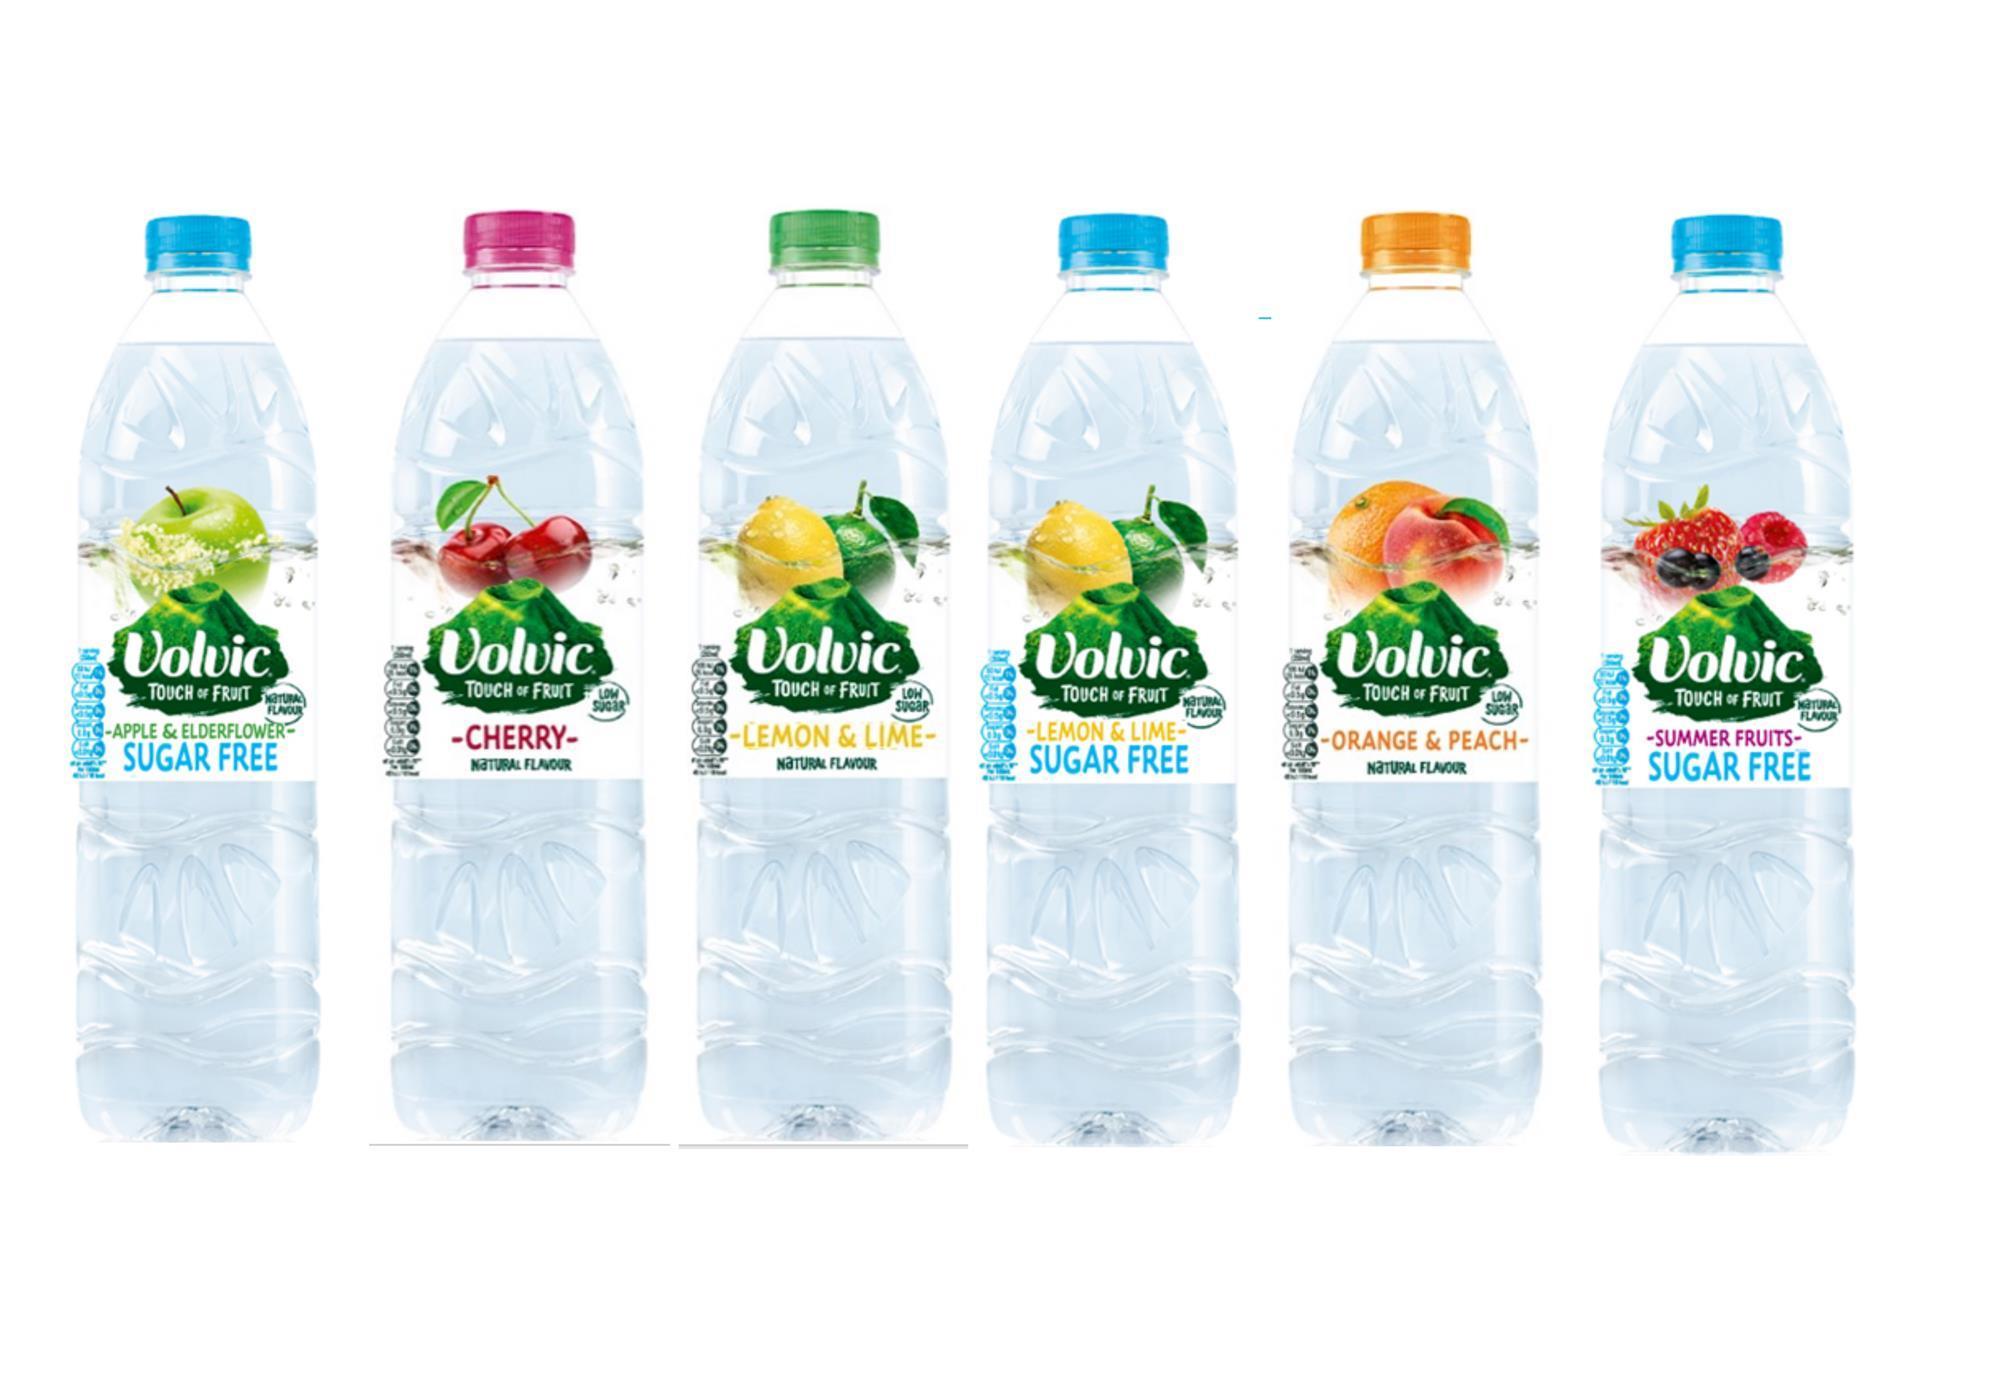 Volvic Touch of Fruit Sugar Free 1.5L - (Watermelon/Strawberry/Lemon & Lime/Apple & Elderflower/Summer Fruit) - 60p @ Asda